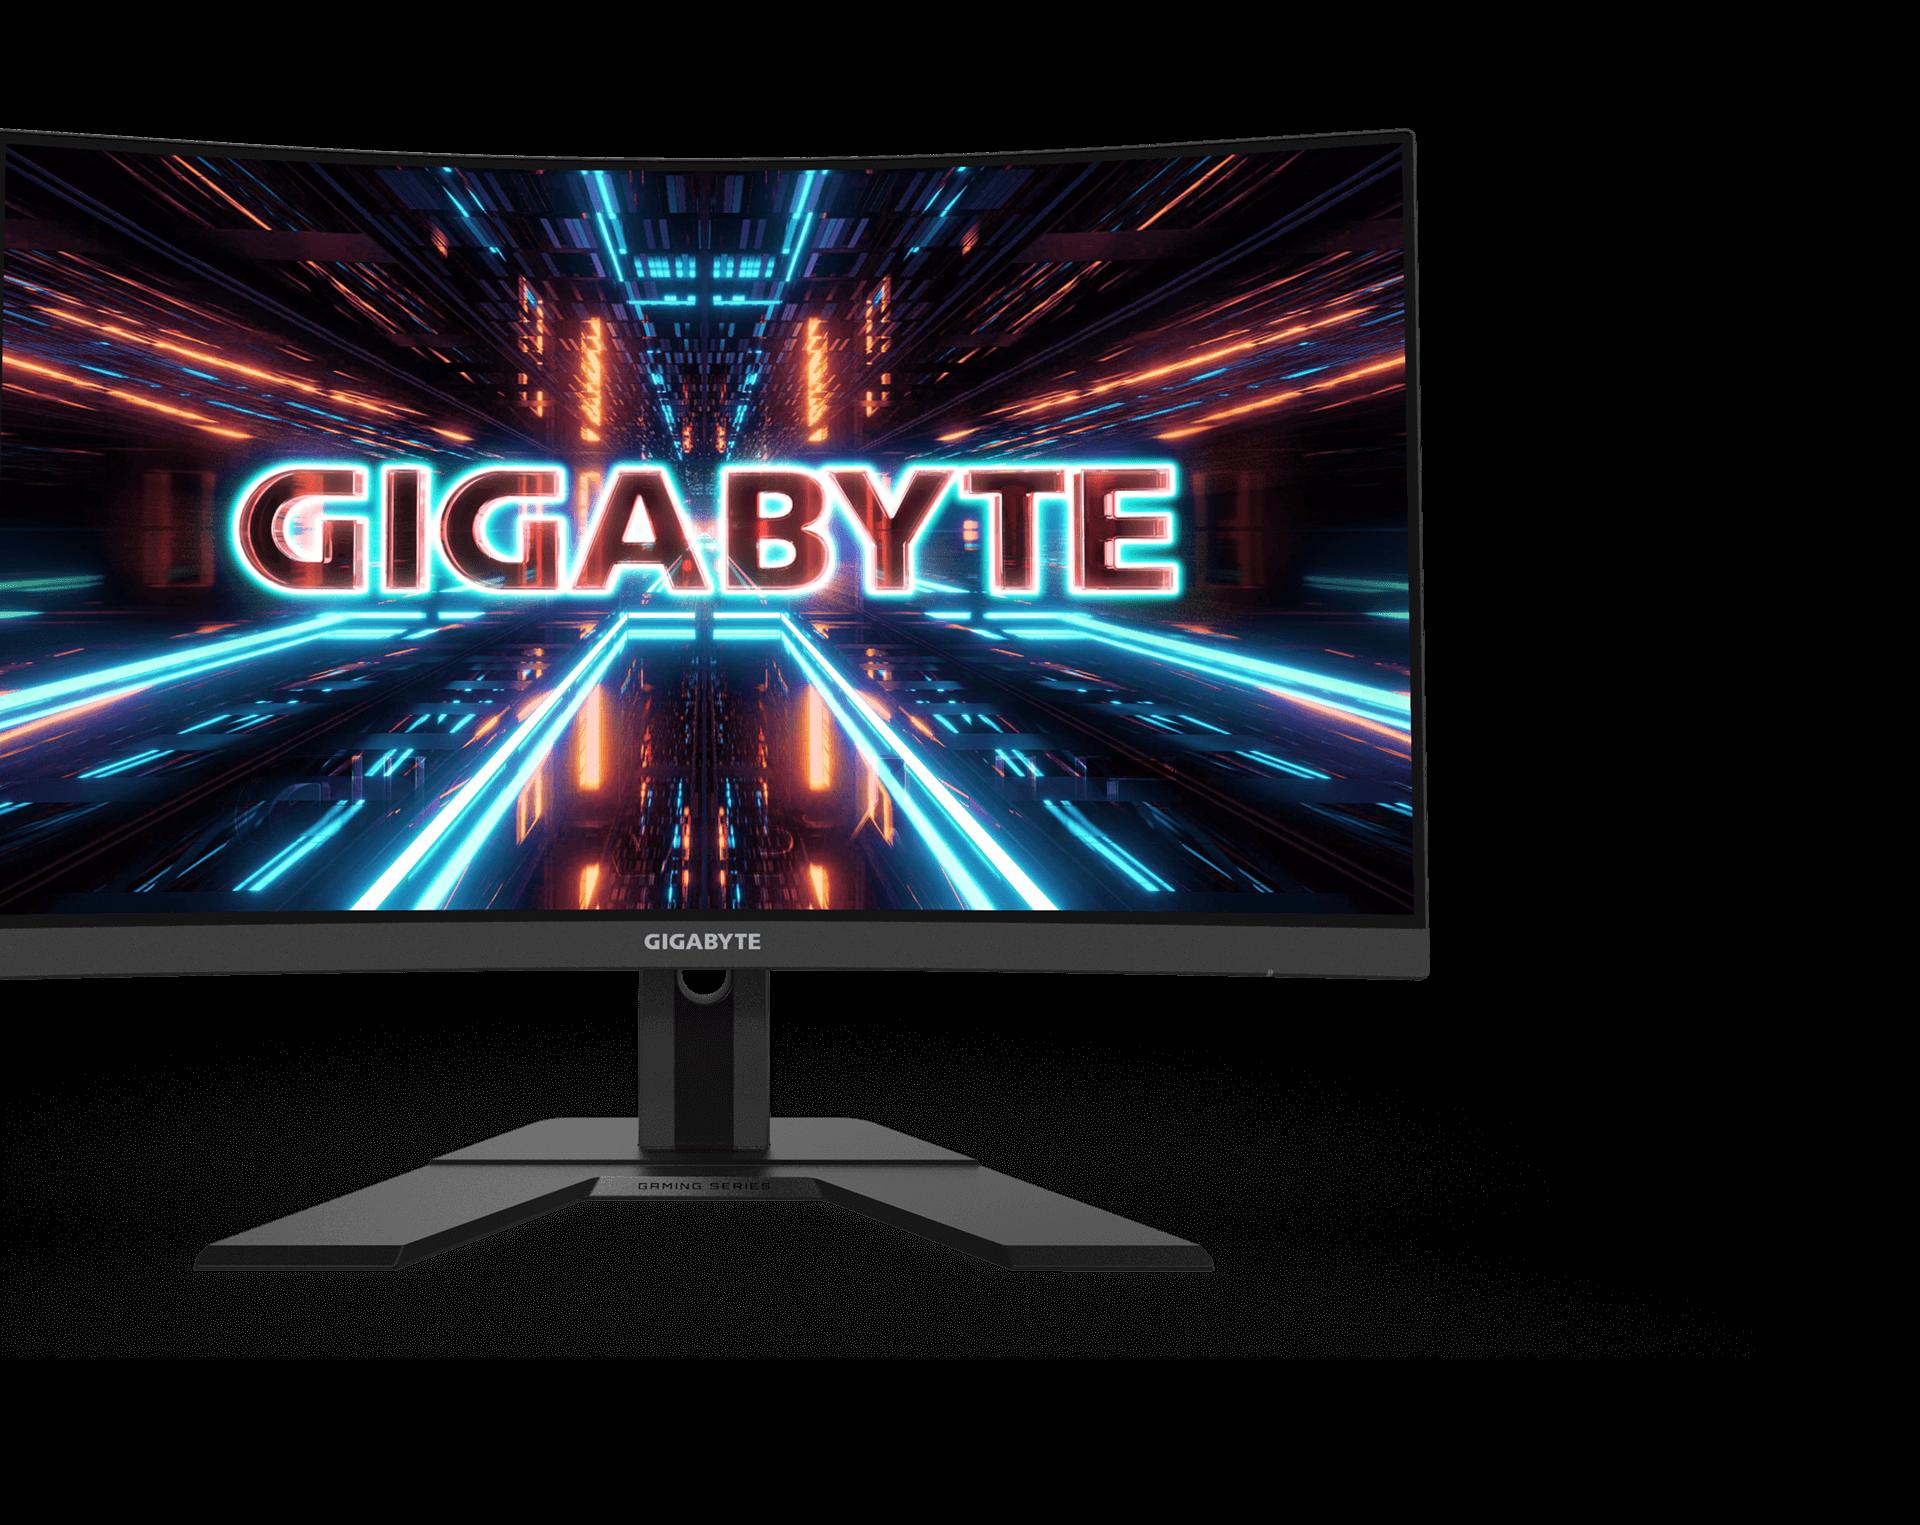 Gigabyte G27FC Gaming Monitor FHD 165Hz 1ms 12